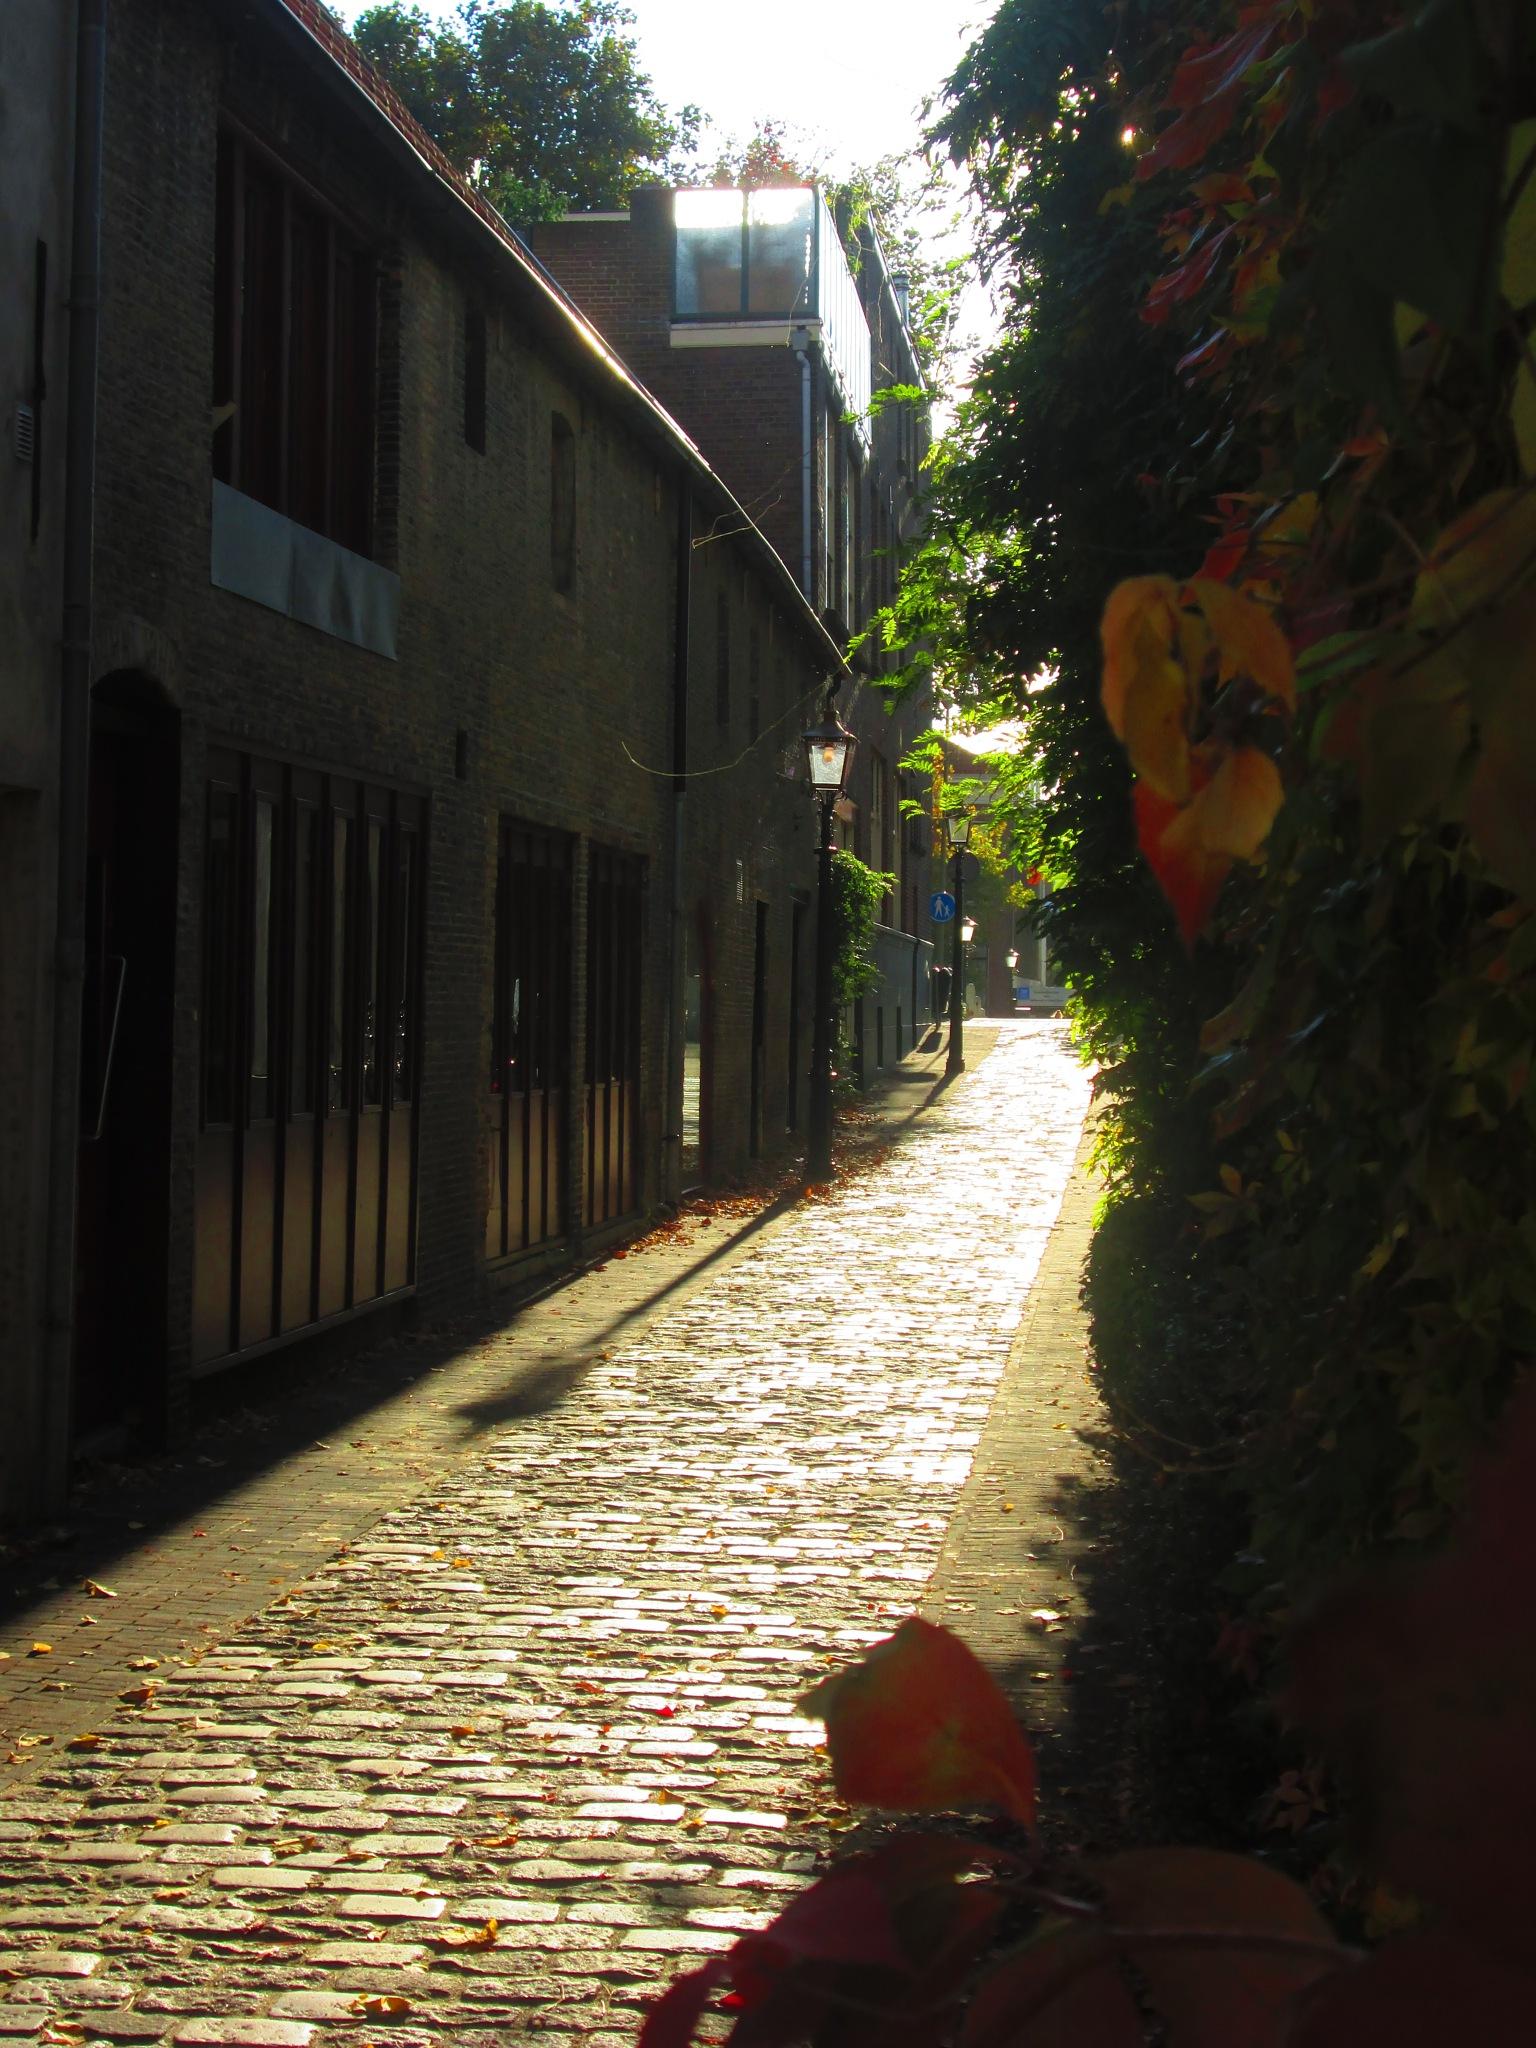 Sunrise on Schiedam, Holland by Facts60